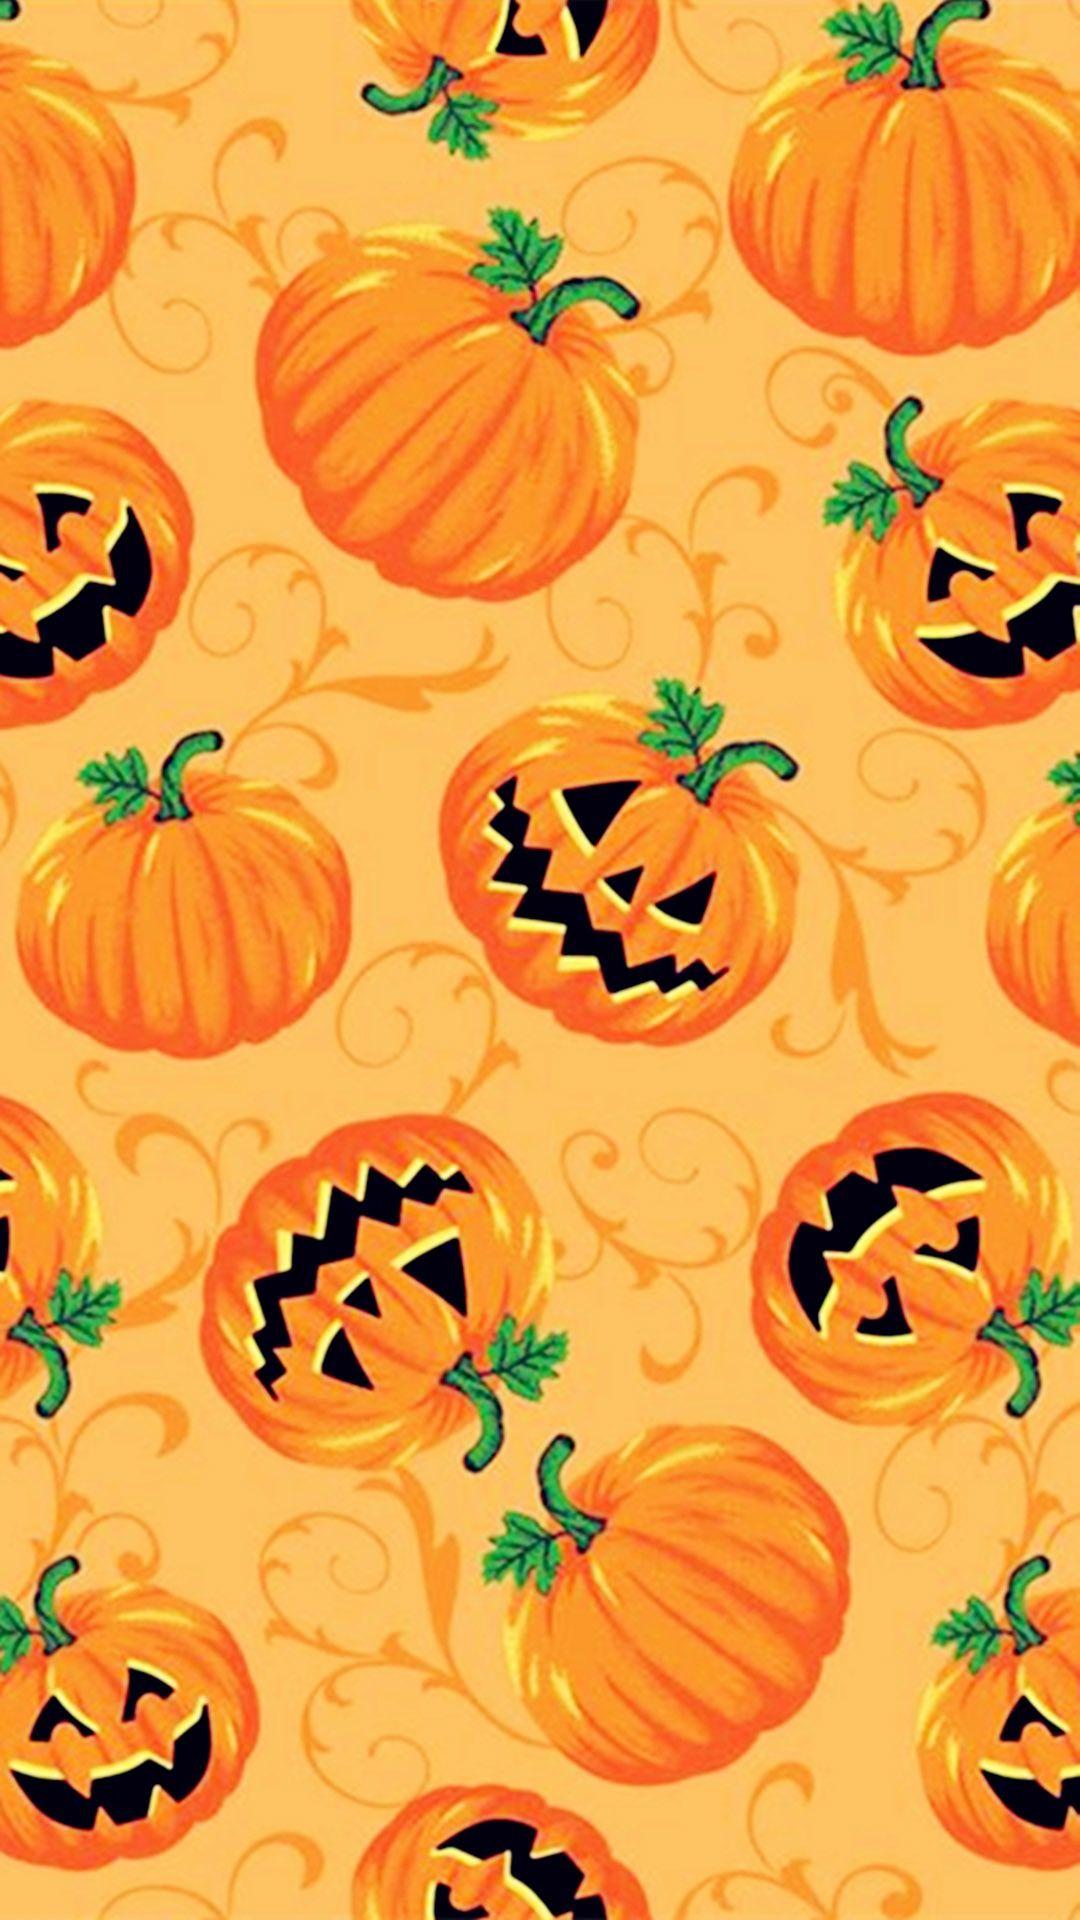 Pumpkins Halloween wallpaper iphone, Halloween wallpaper